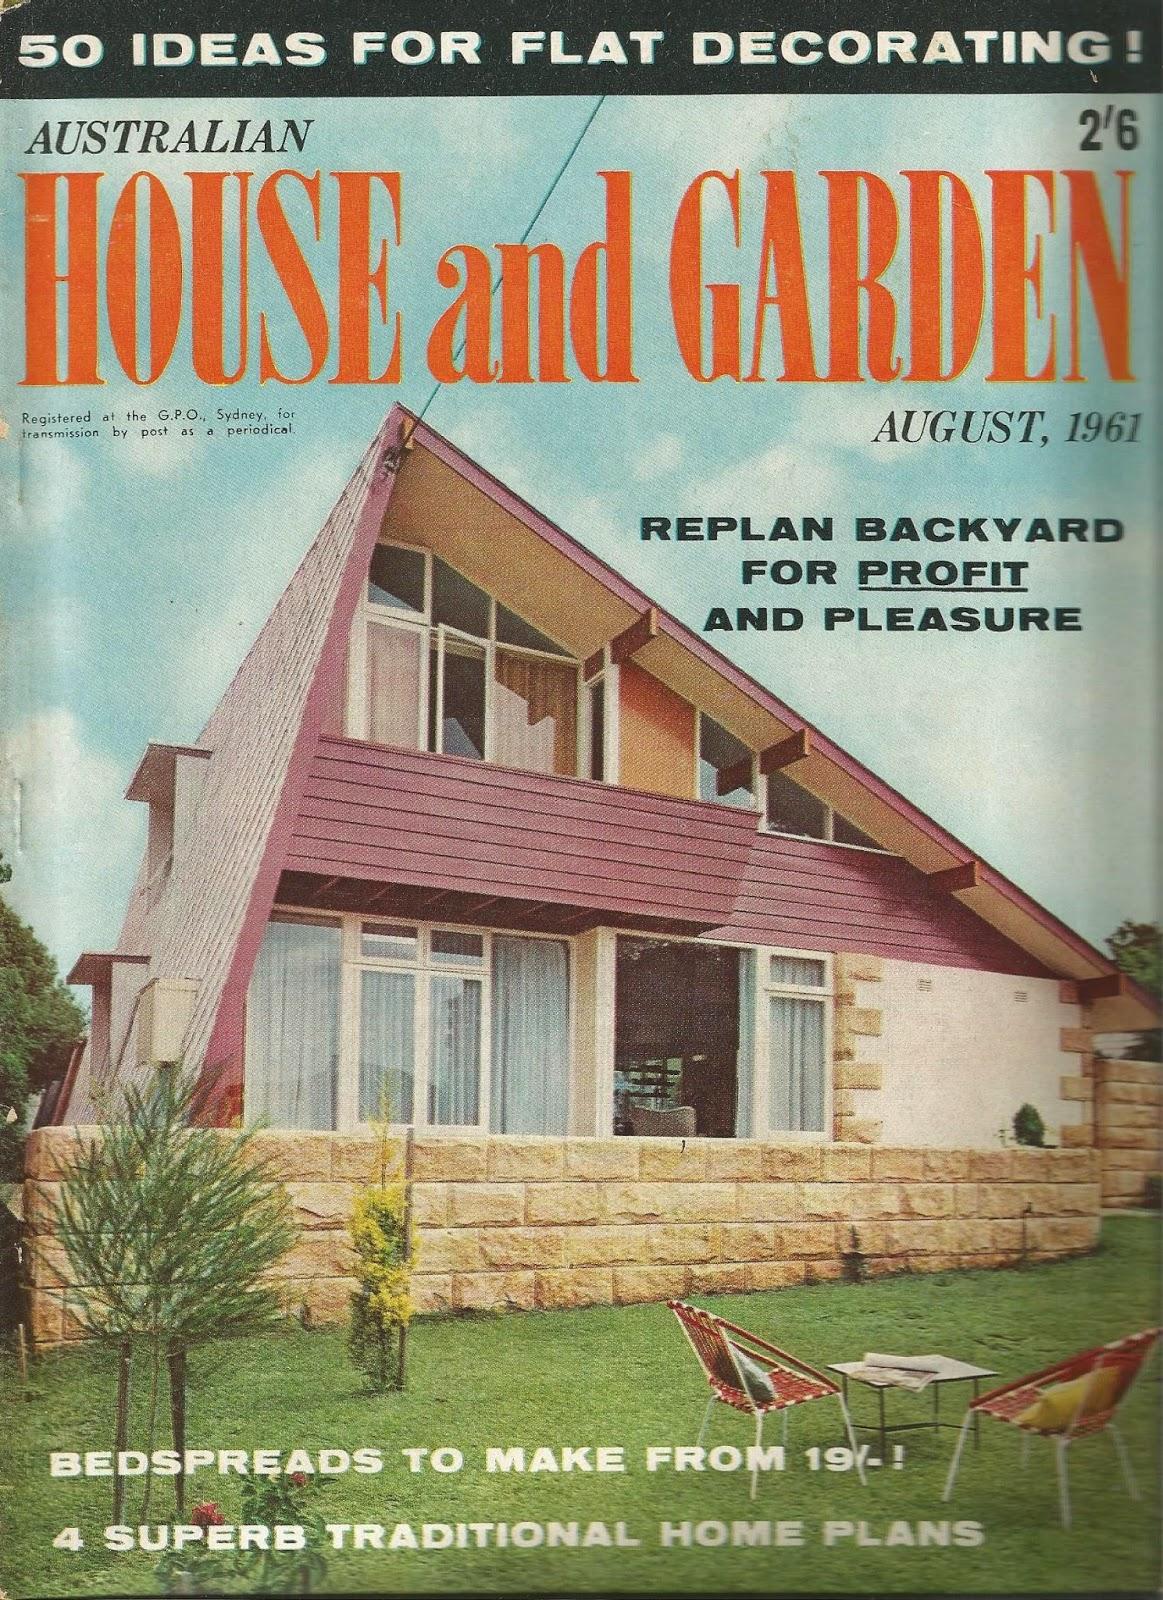 Australian House & Garden,  August 1961